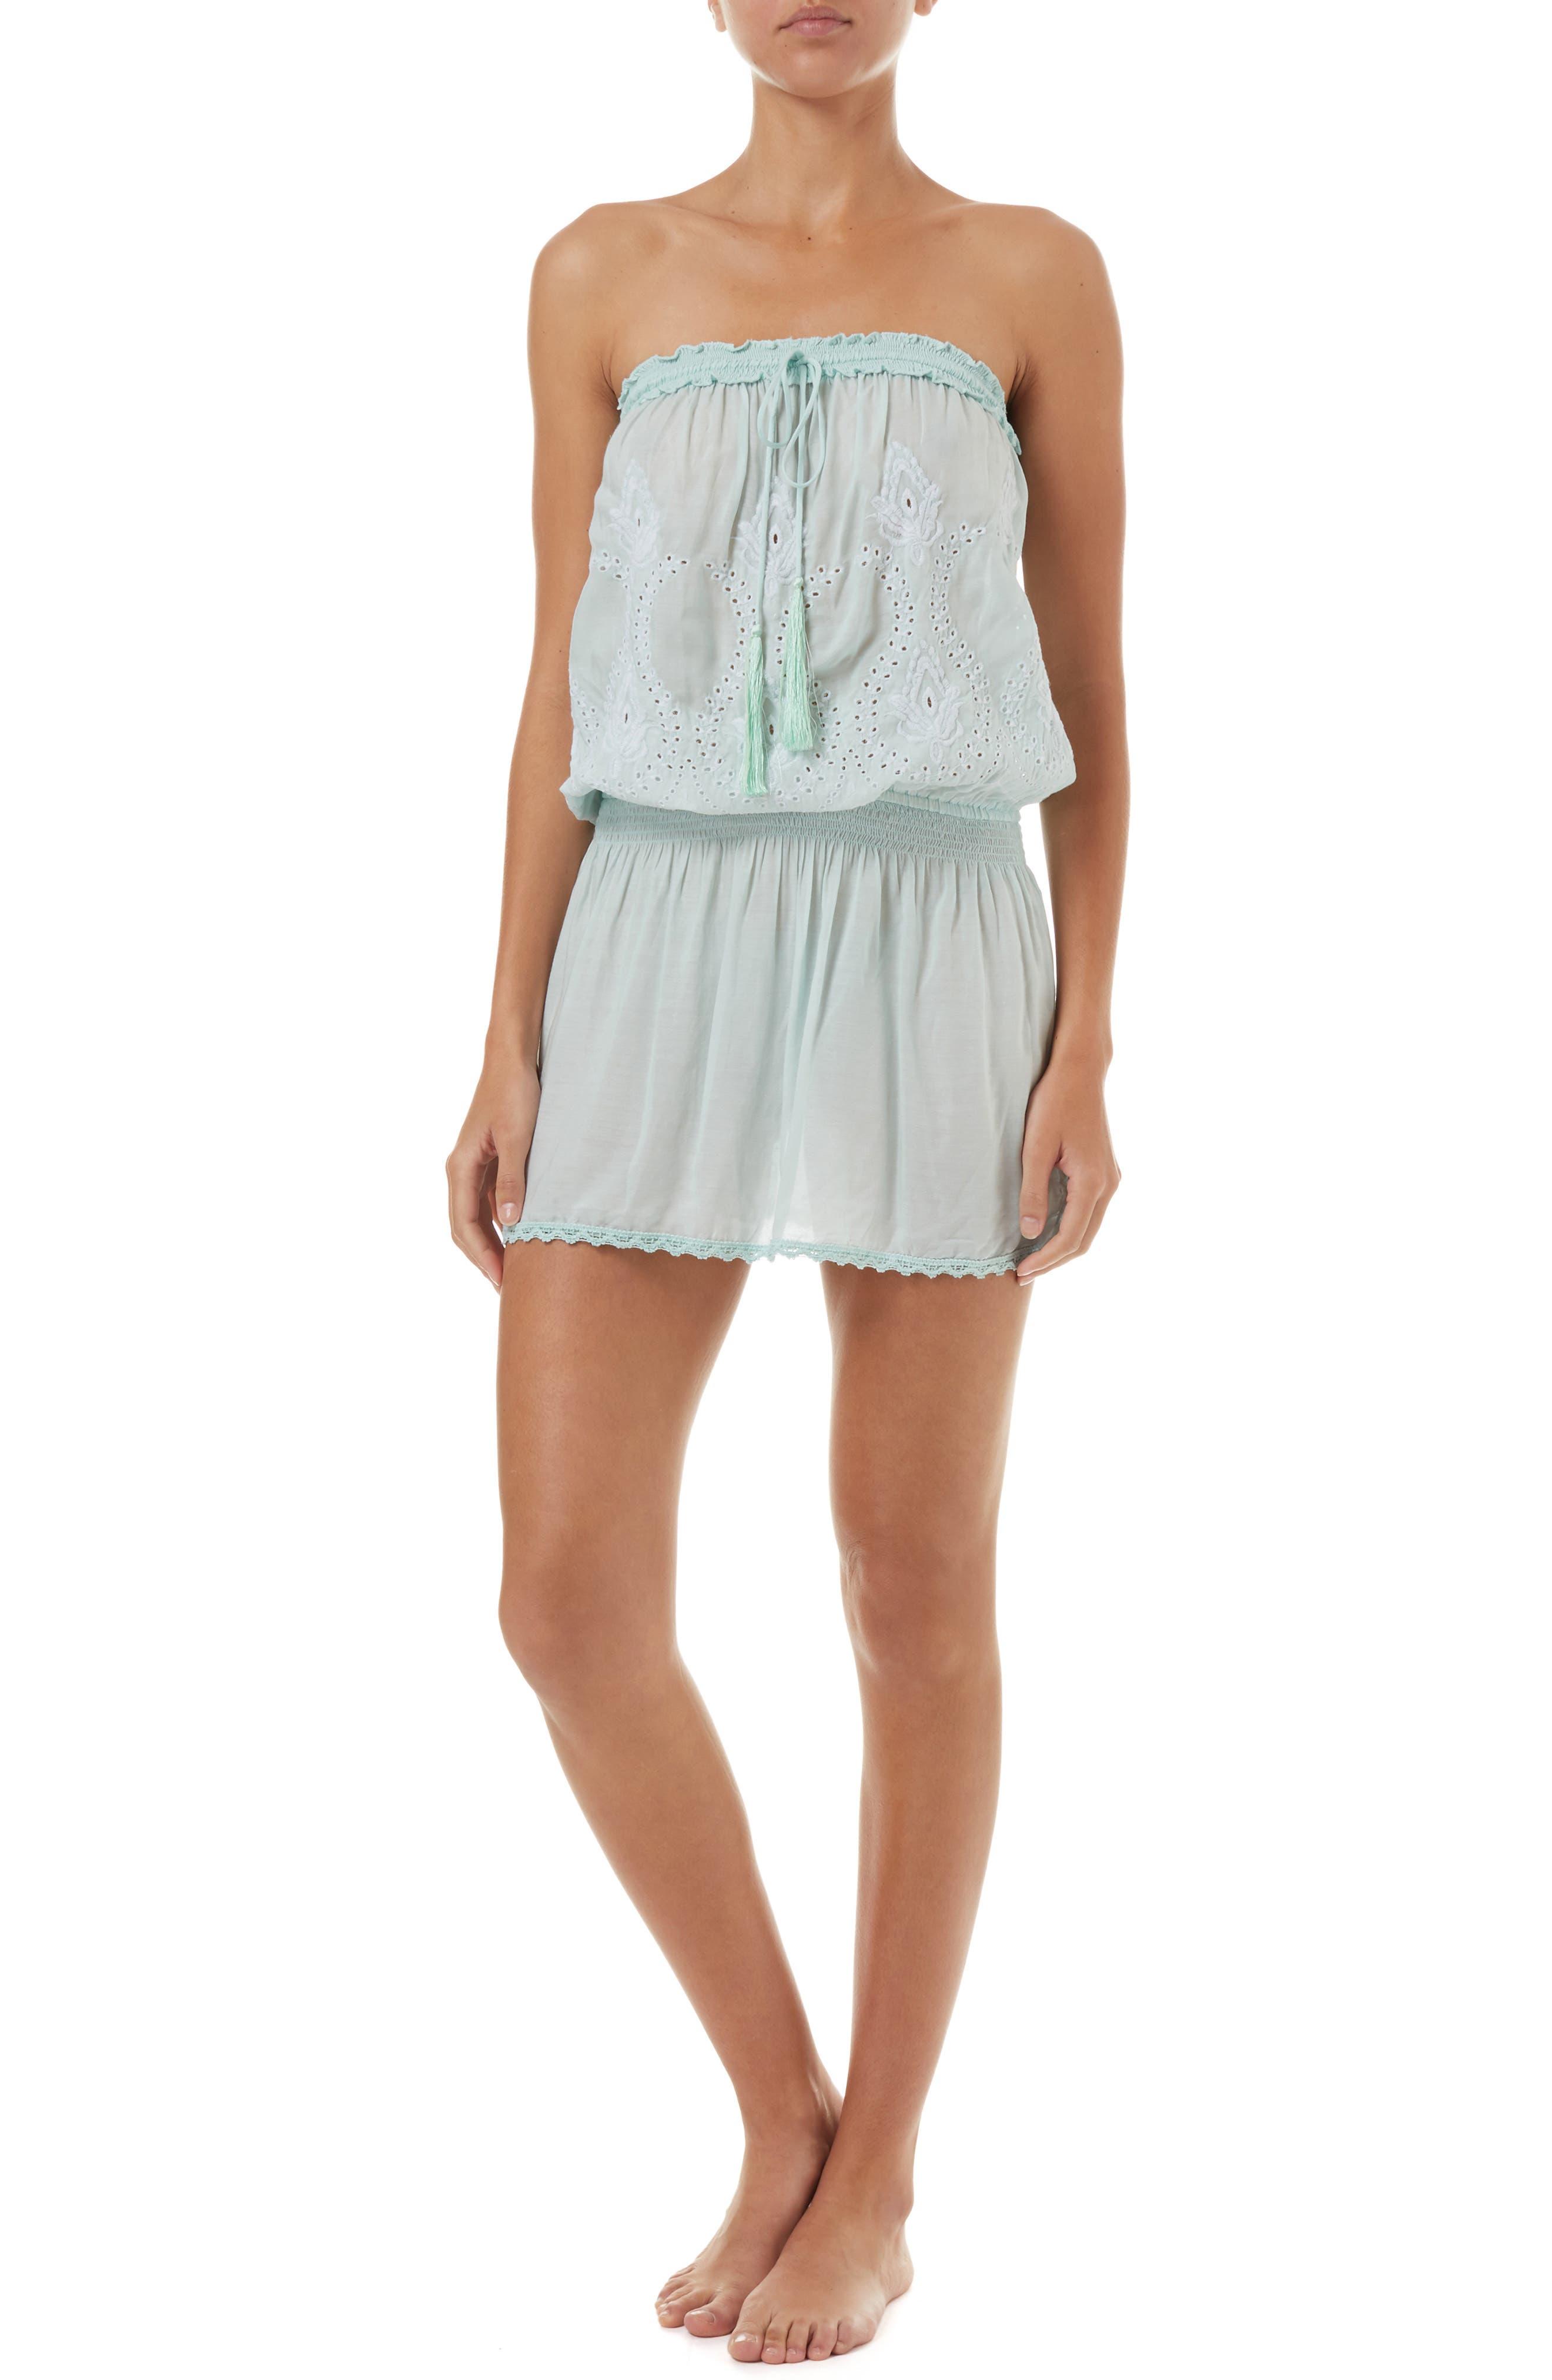 MELISSA ODABASH,                             Fruley Cover-Up Dress,                             Main thumbnail 1, color,                             MINT/ WHITE